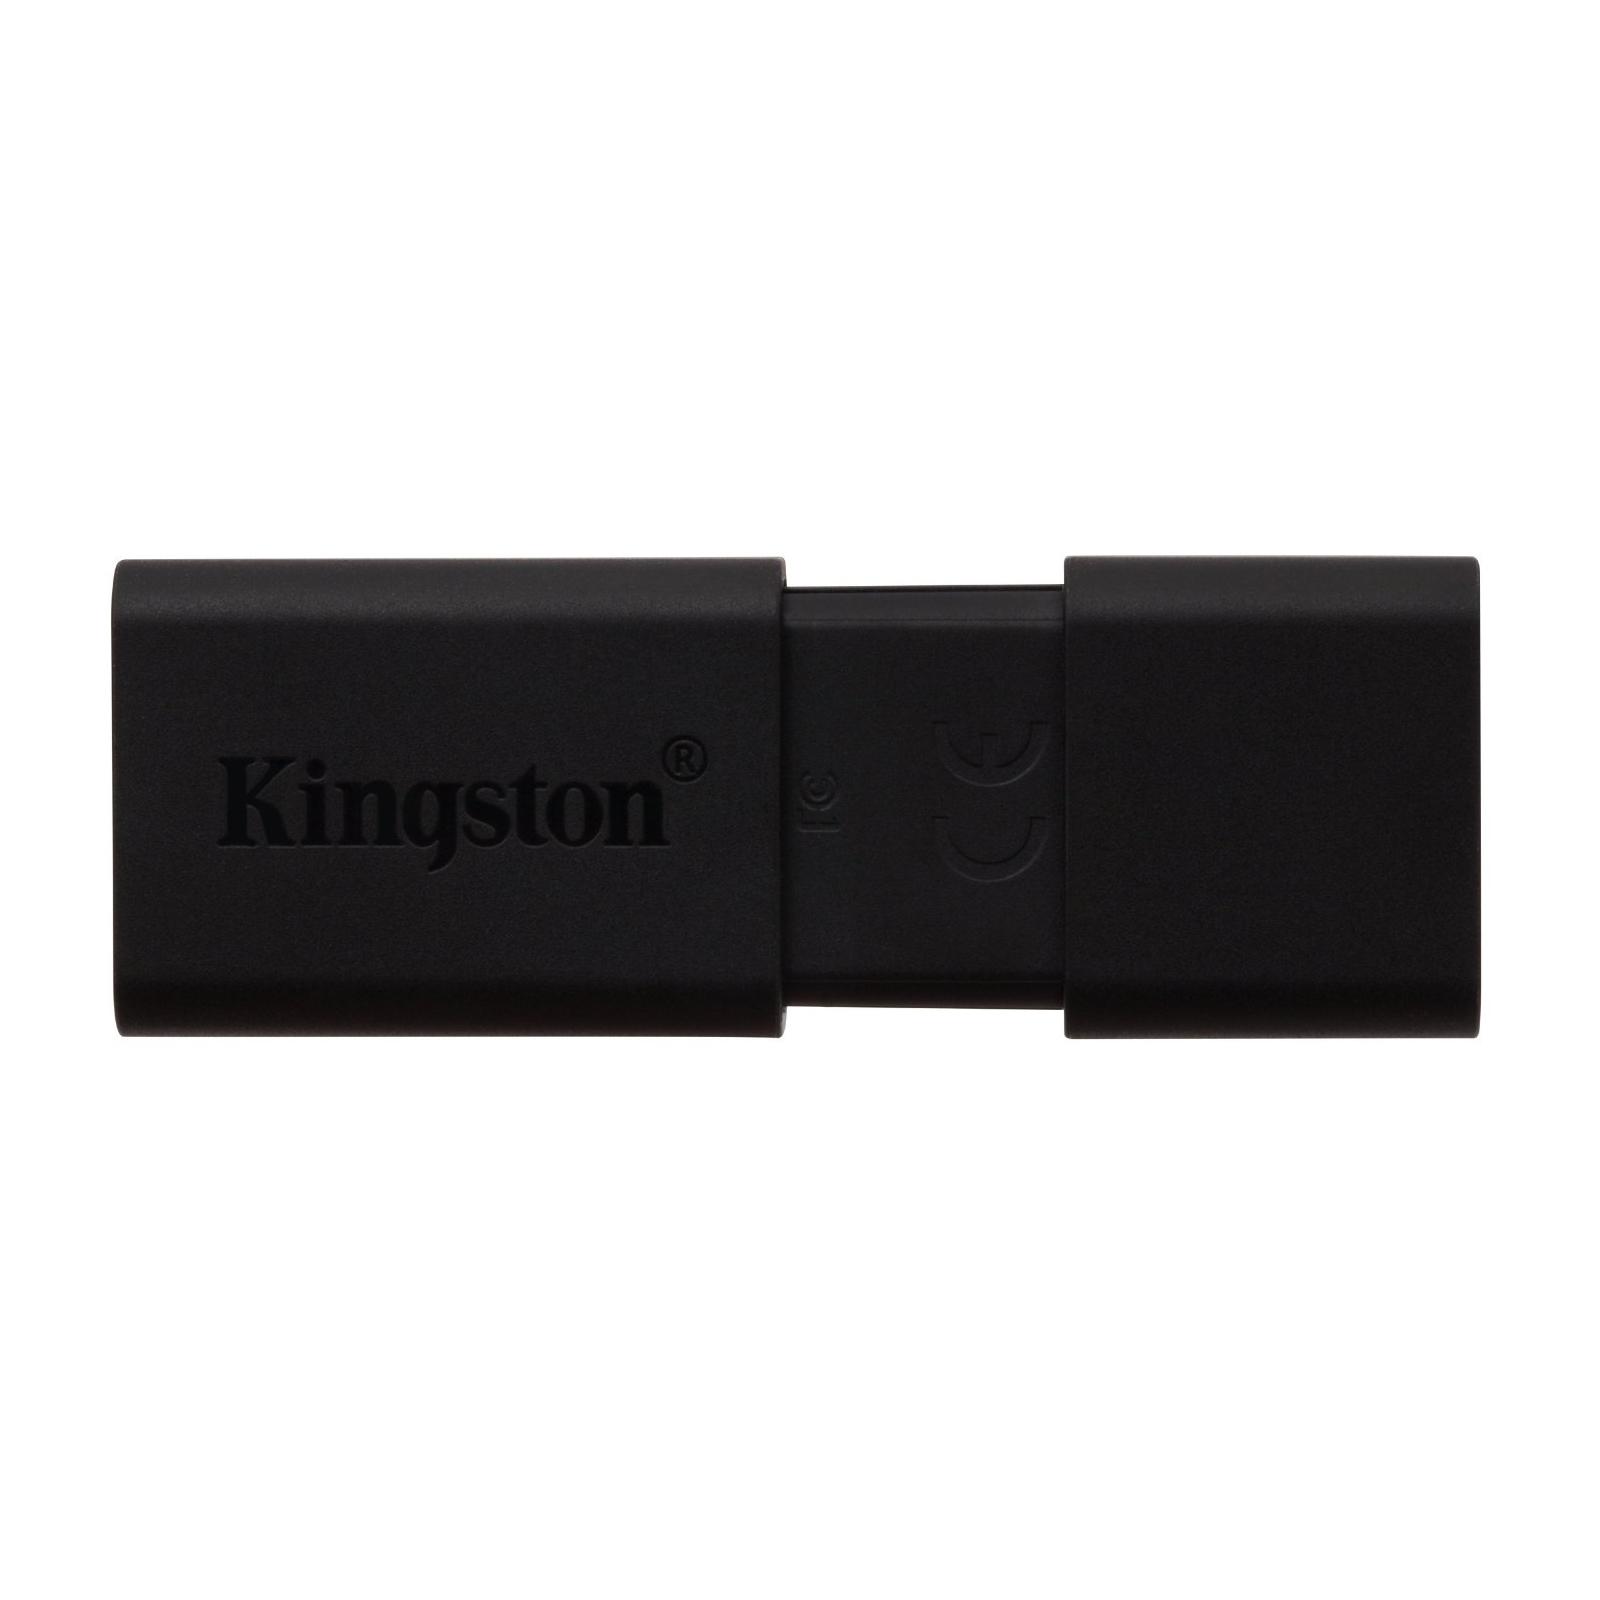 USB флеш накопитель Kingston 32Gb DataTraveler 100 Generation 3 USB3.0 (DT100G3/32GB) изображение 2